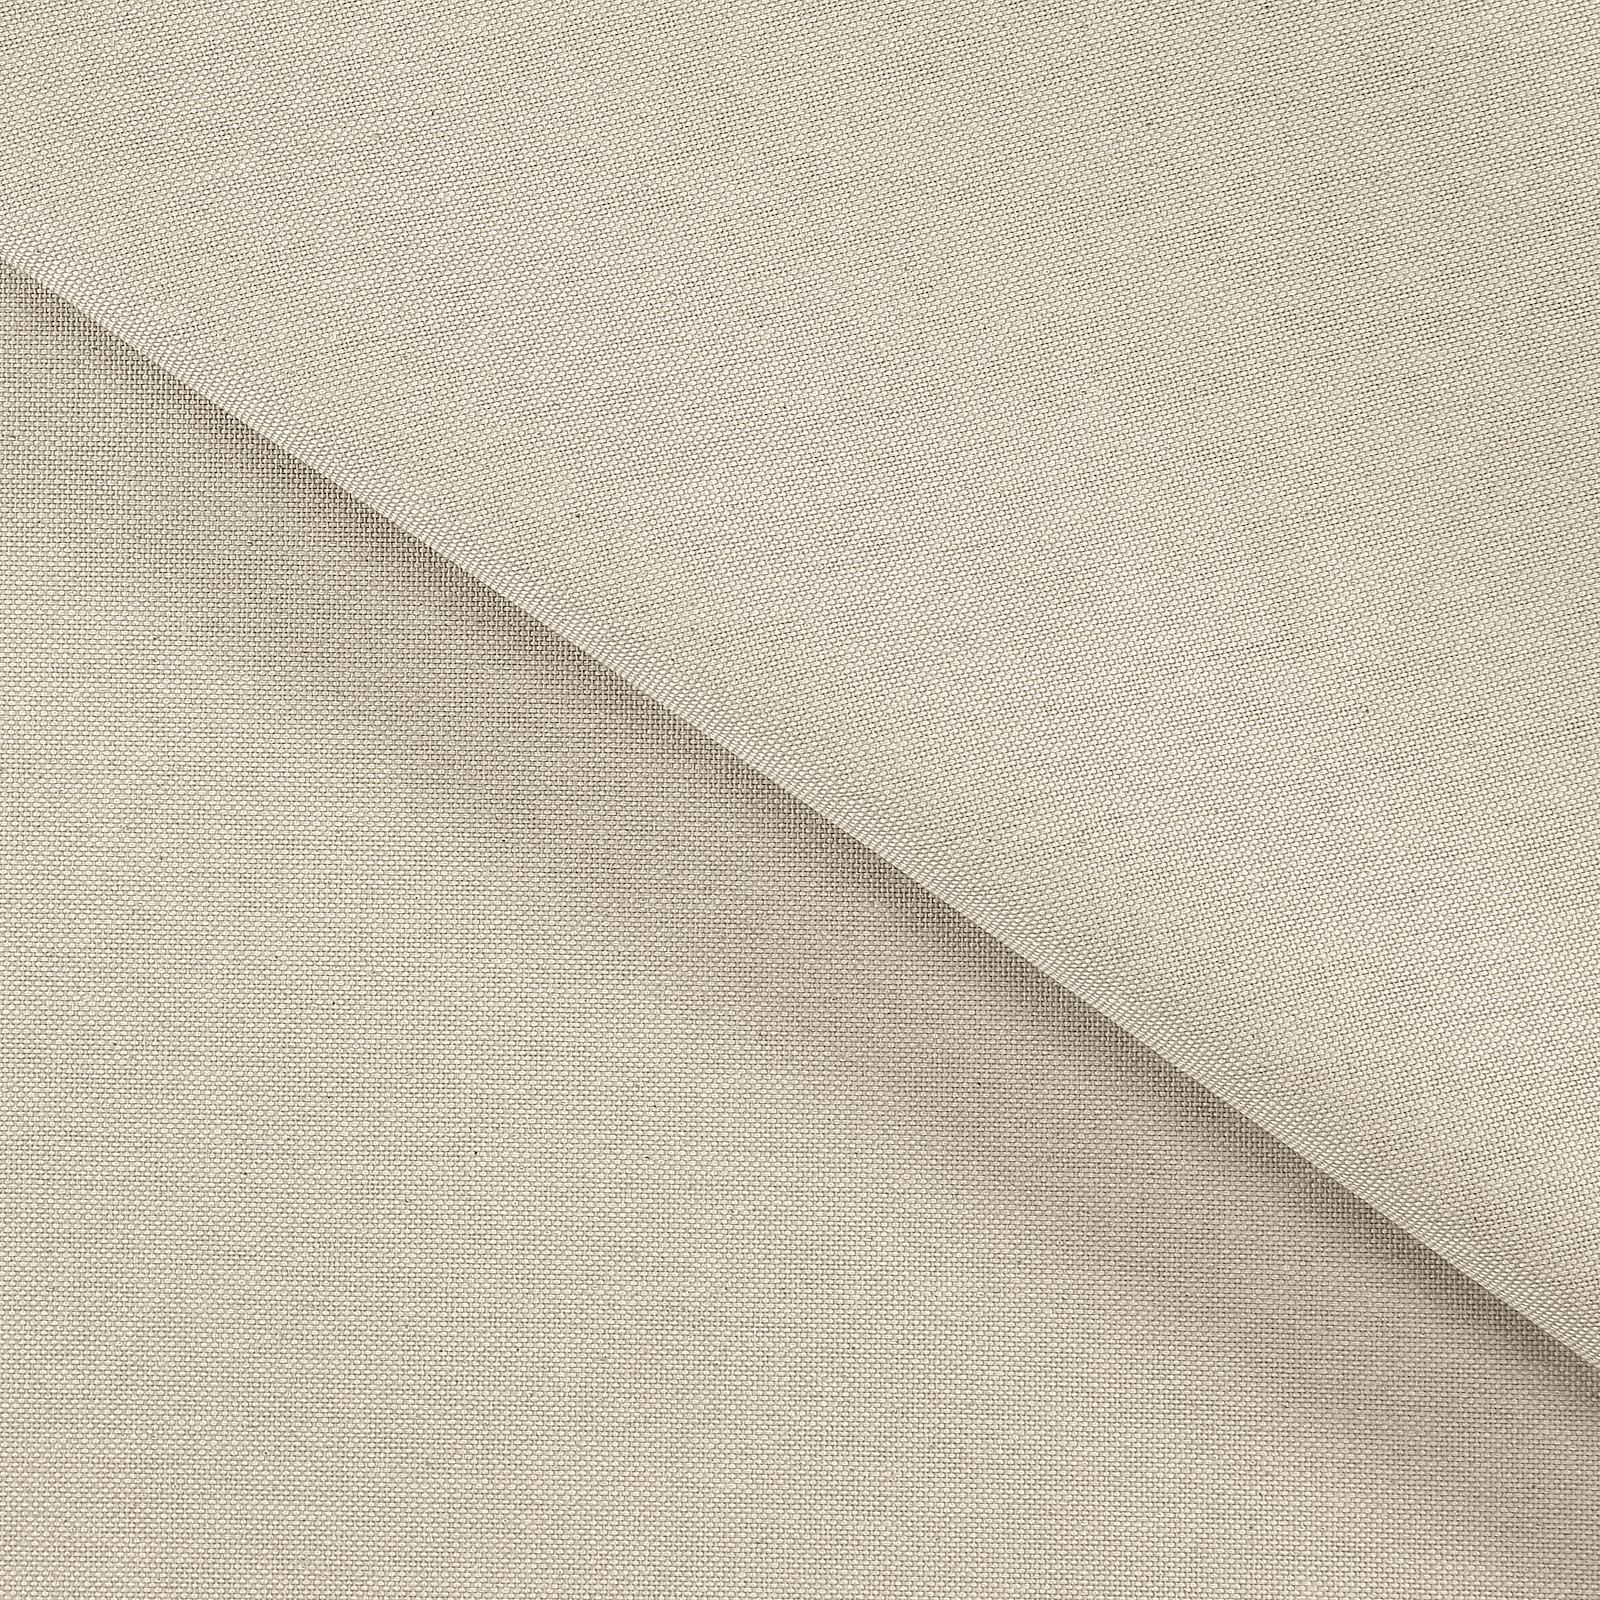 Textilwachstuch Leinenlook Grau 160cm 872301_pack